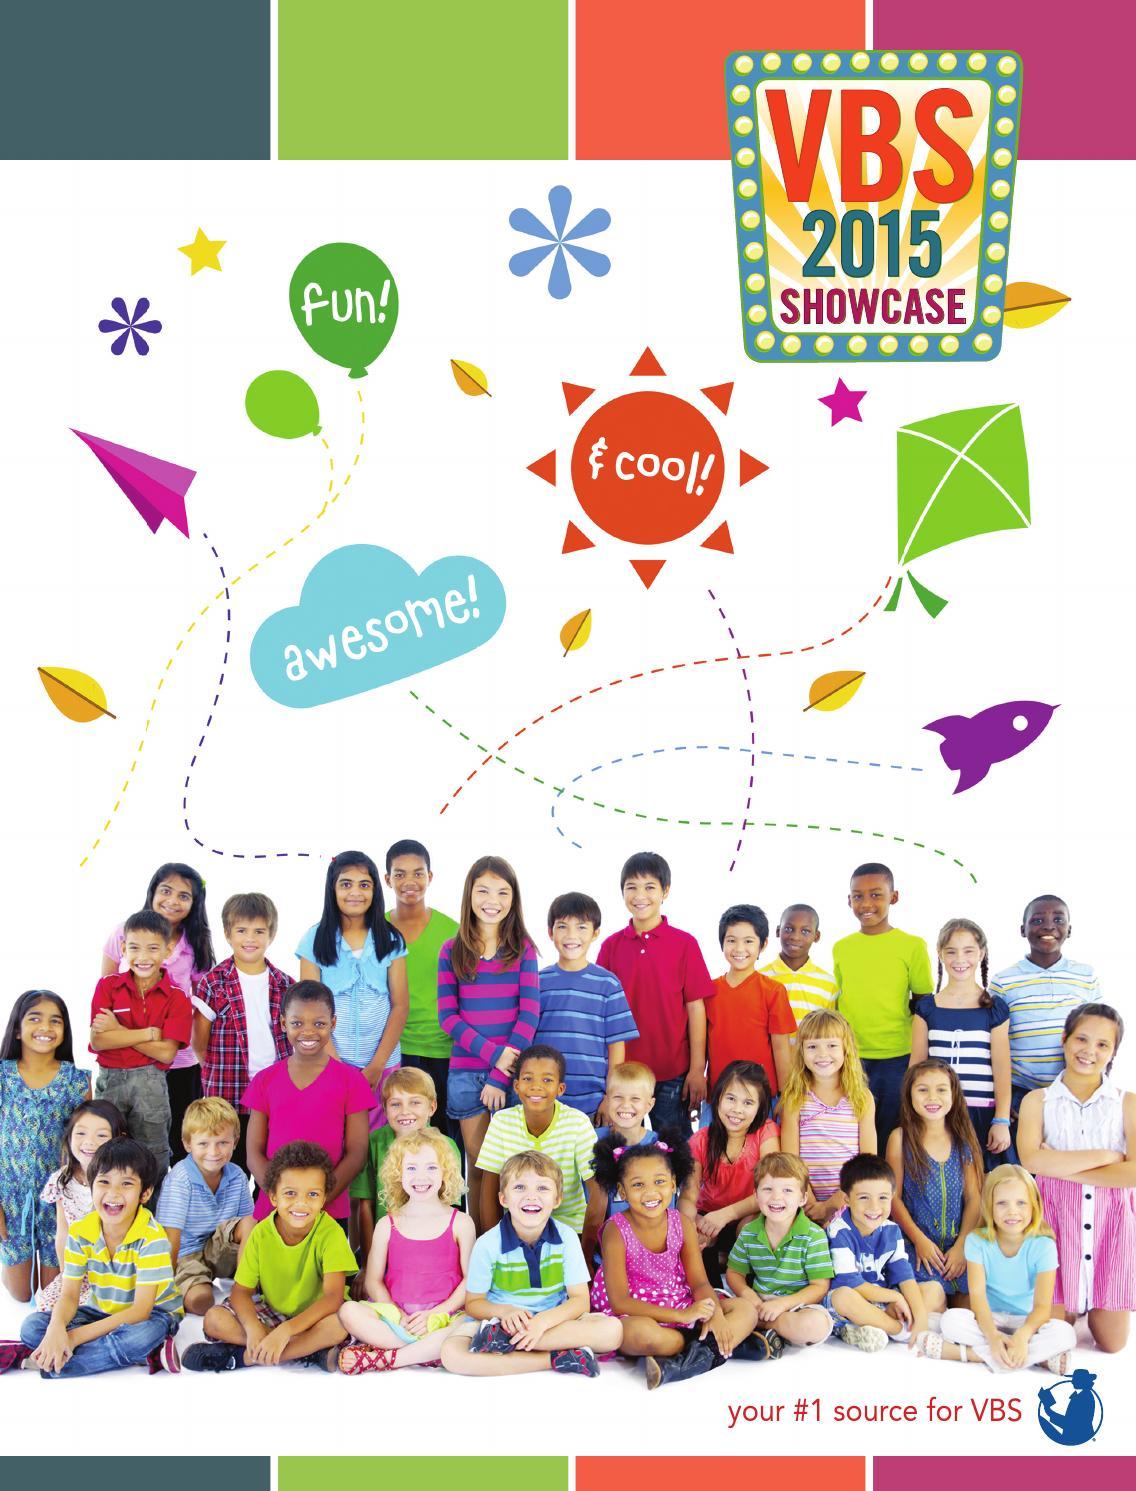 Issuu Vbs Showcase 2015 Catalog By United Methodist